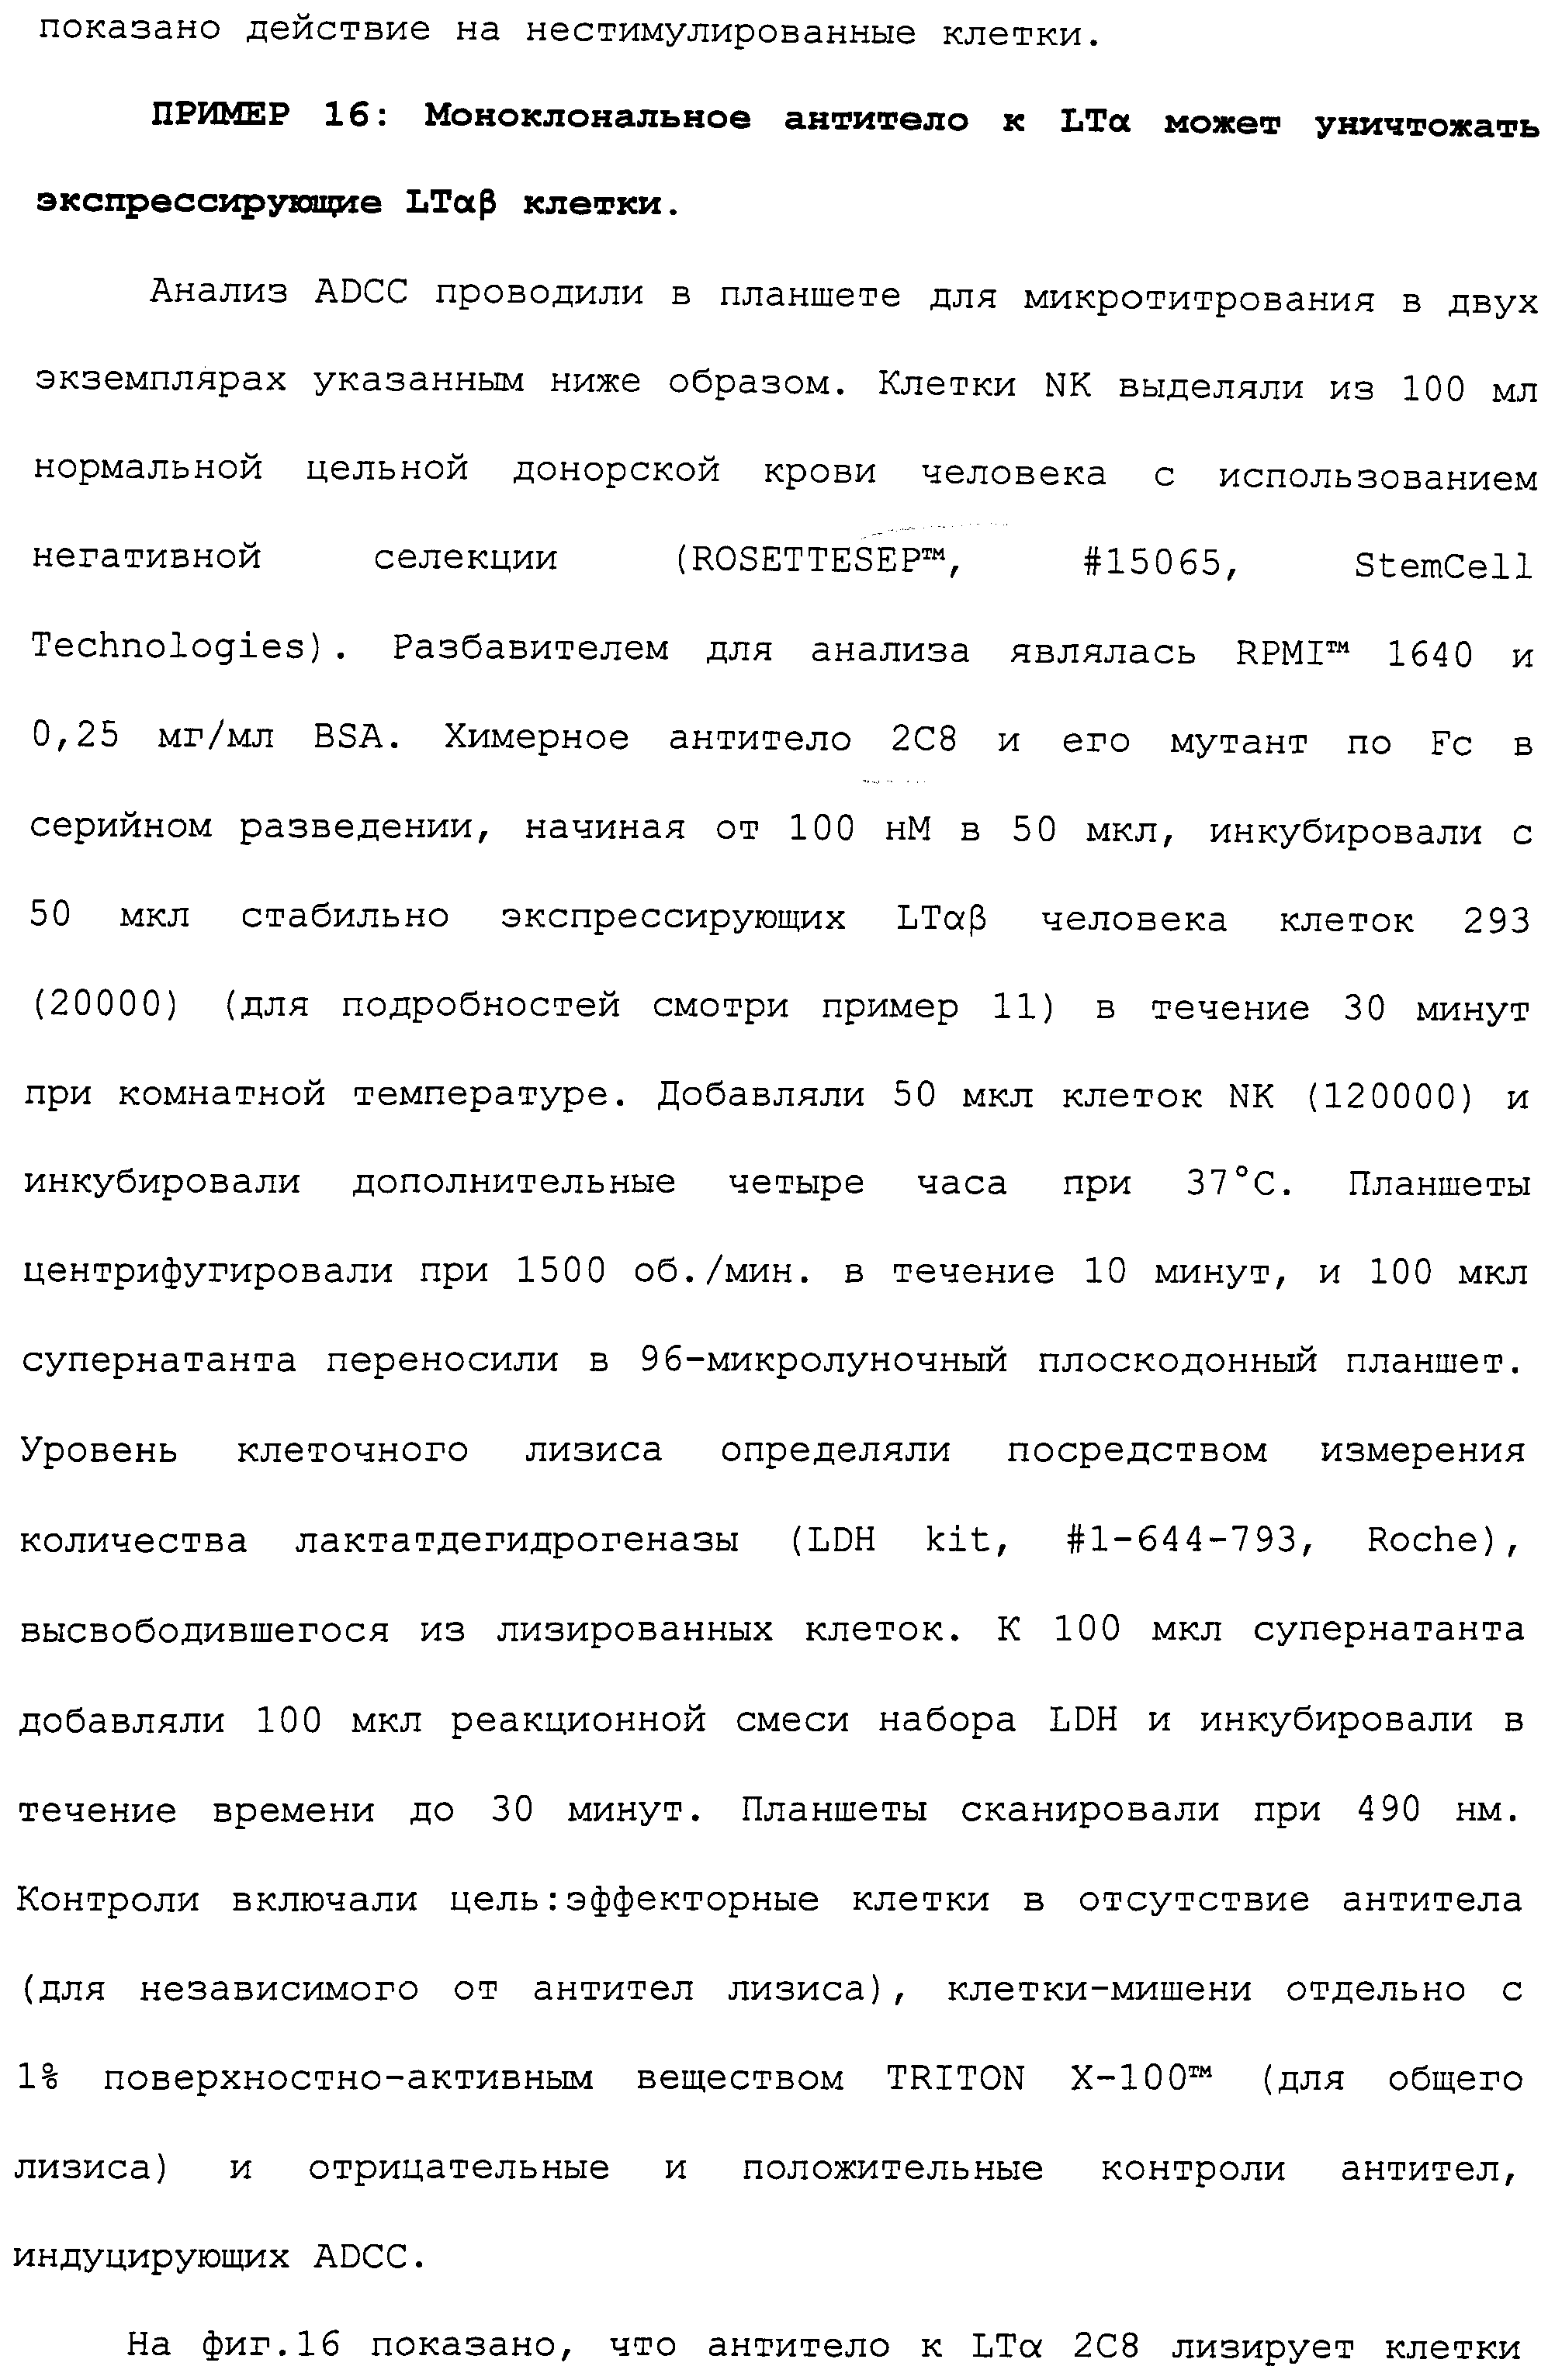 Figure 00000273